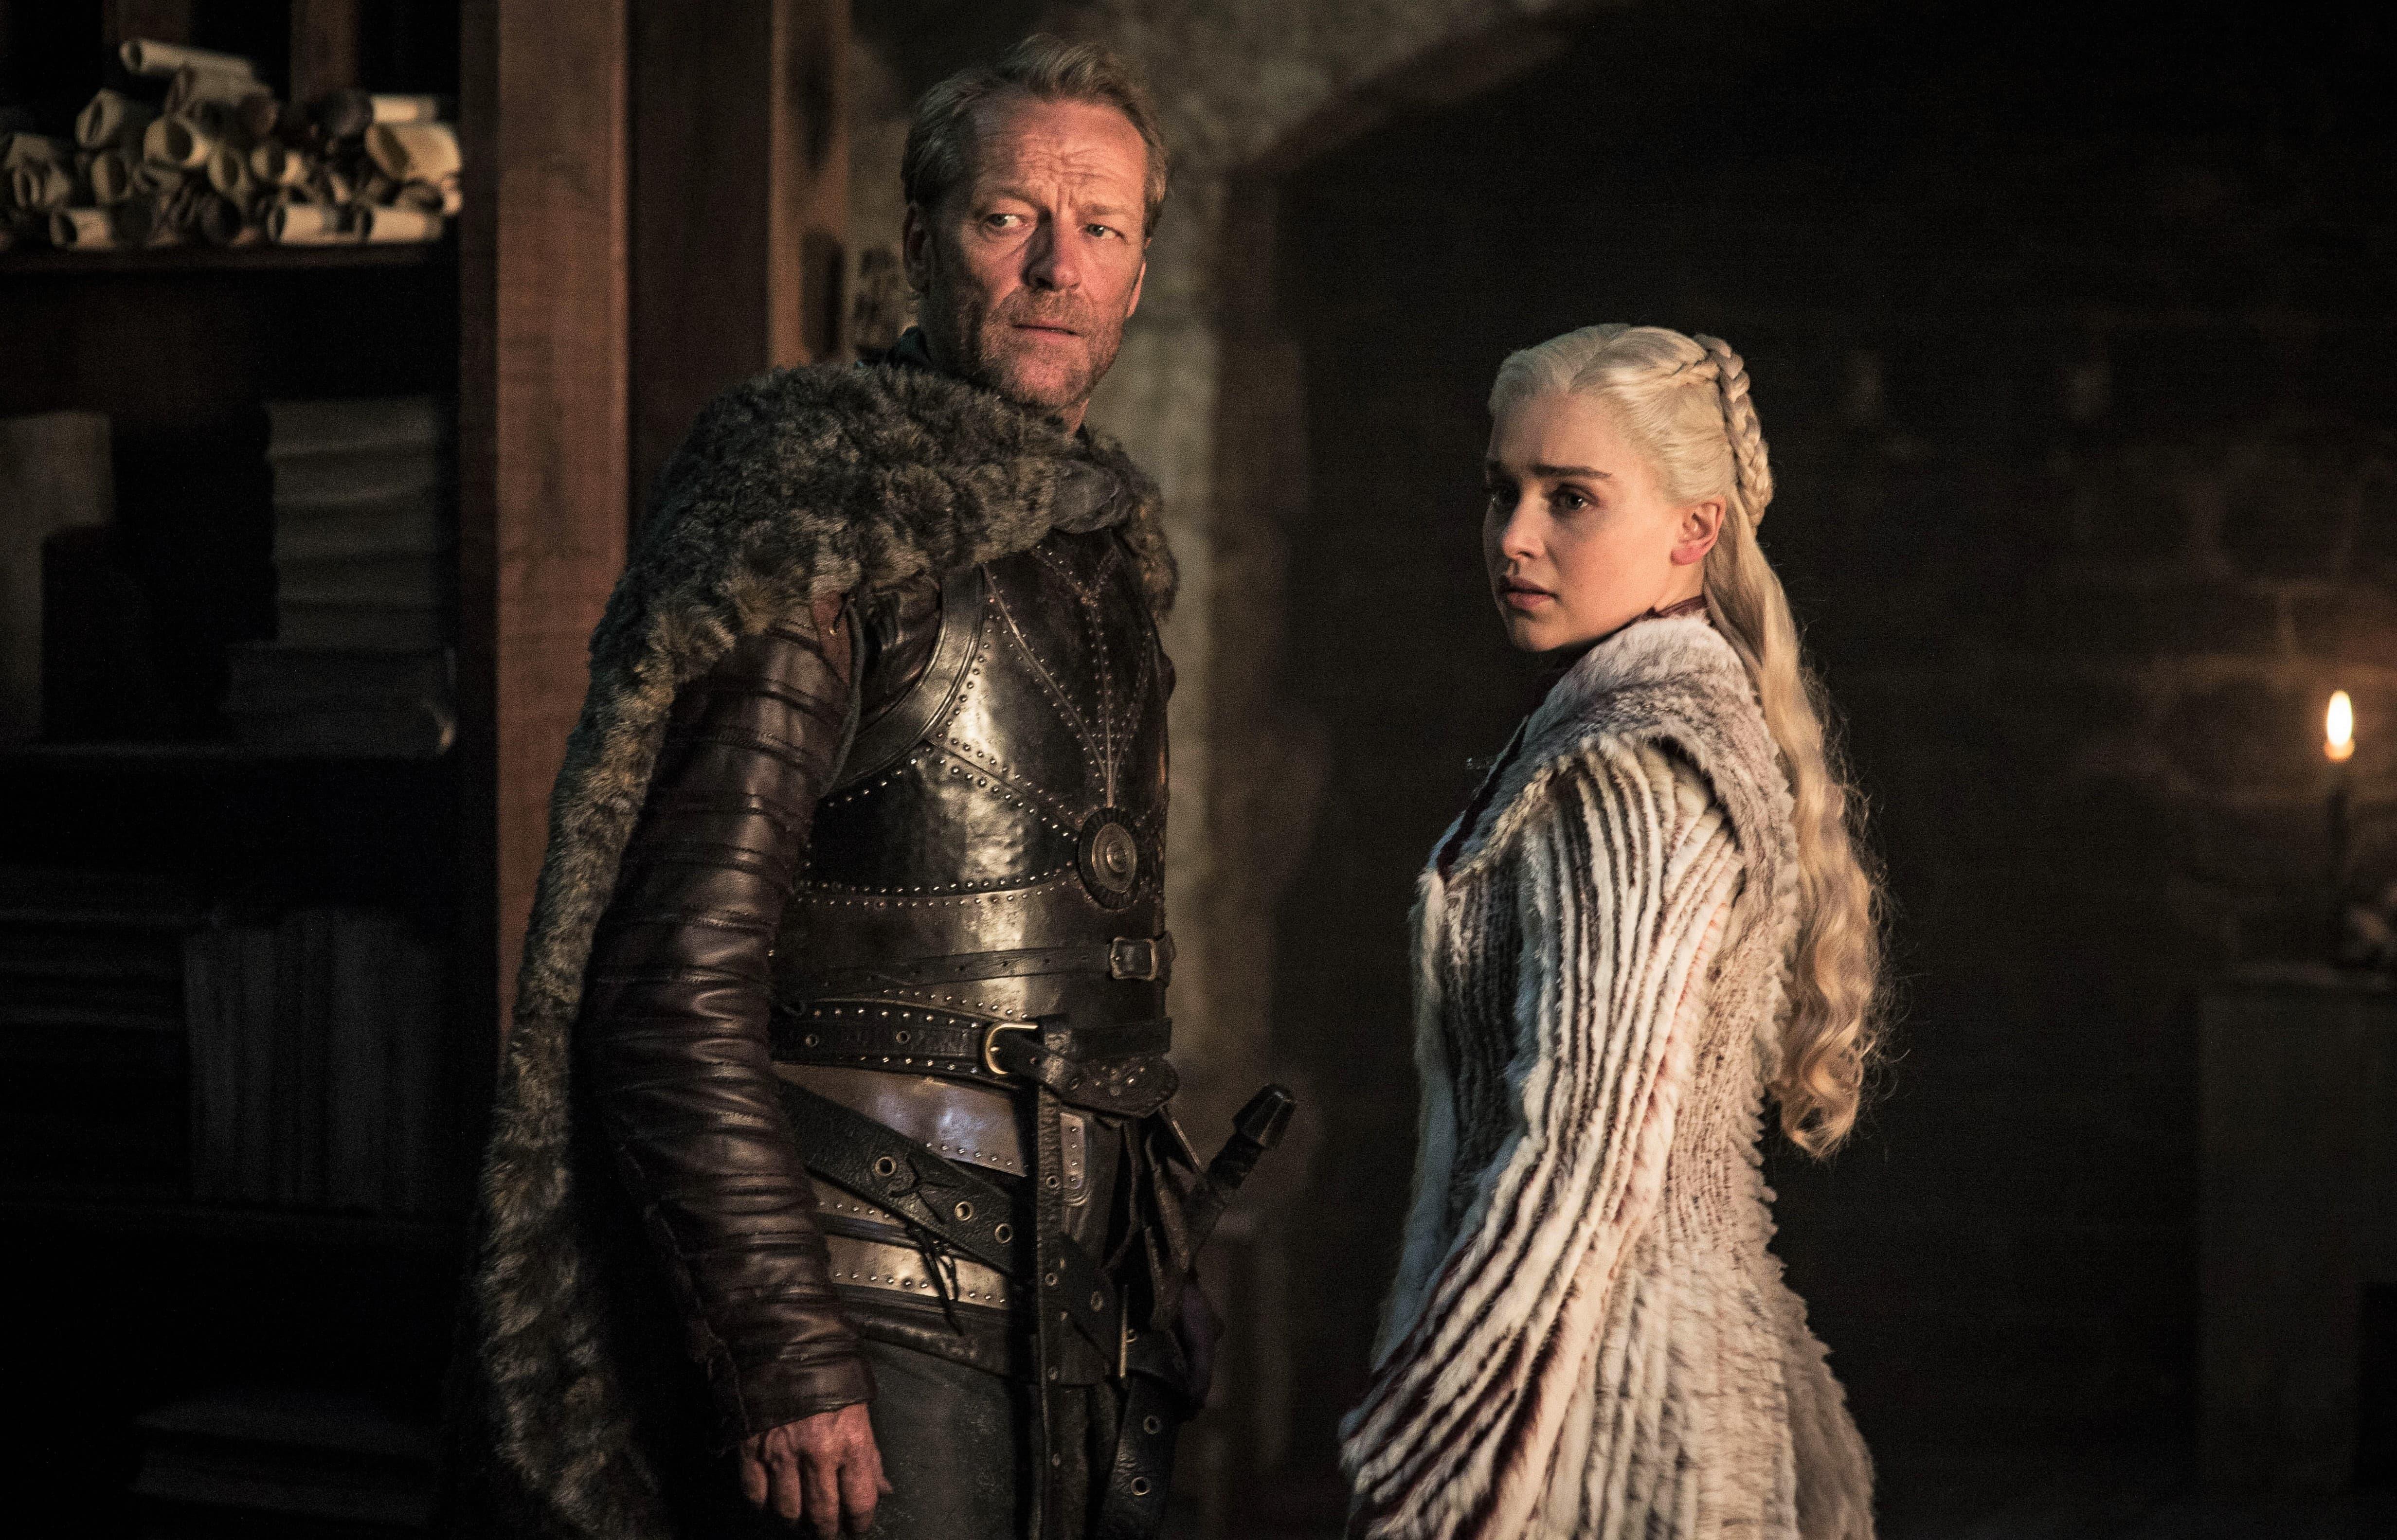 Jorah Mormont Daenerys Targaryen Winterfell Library Season 8